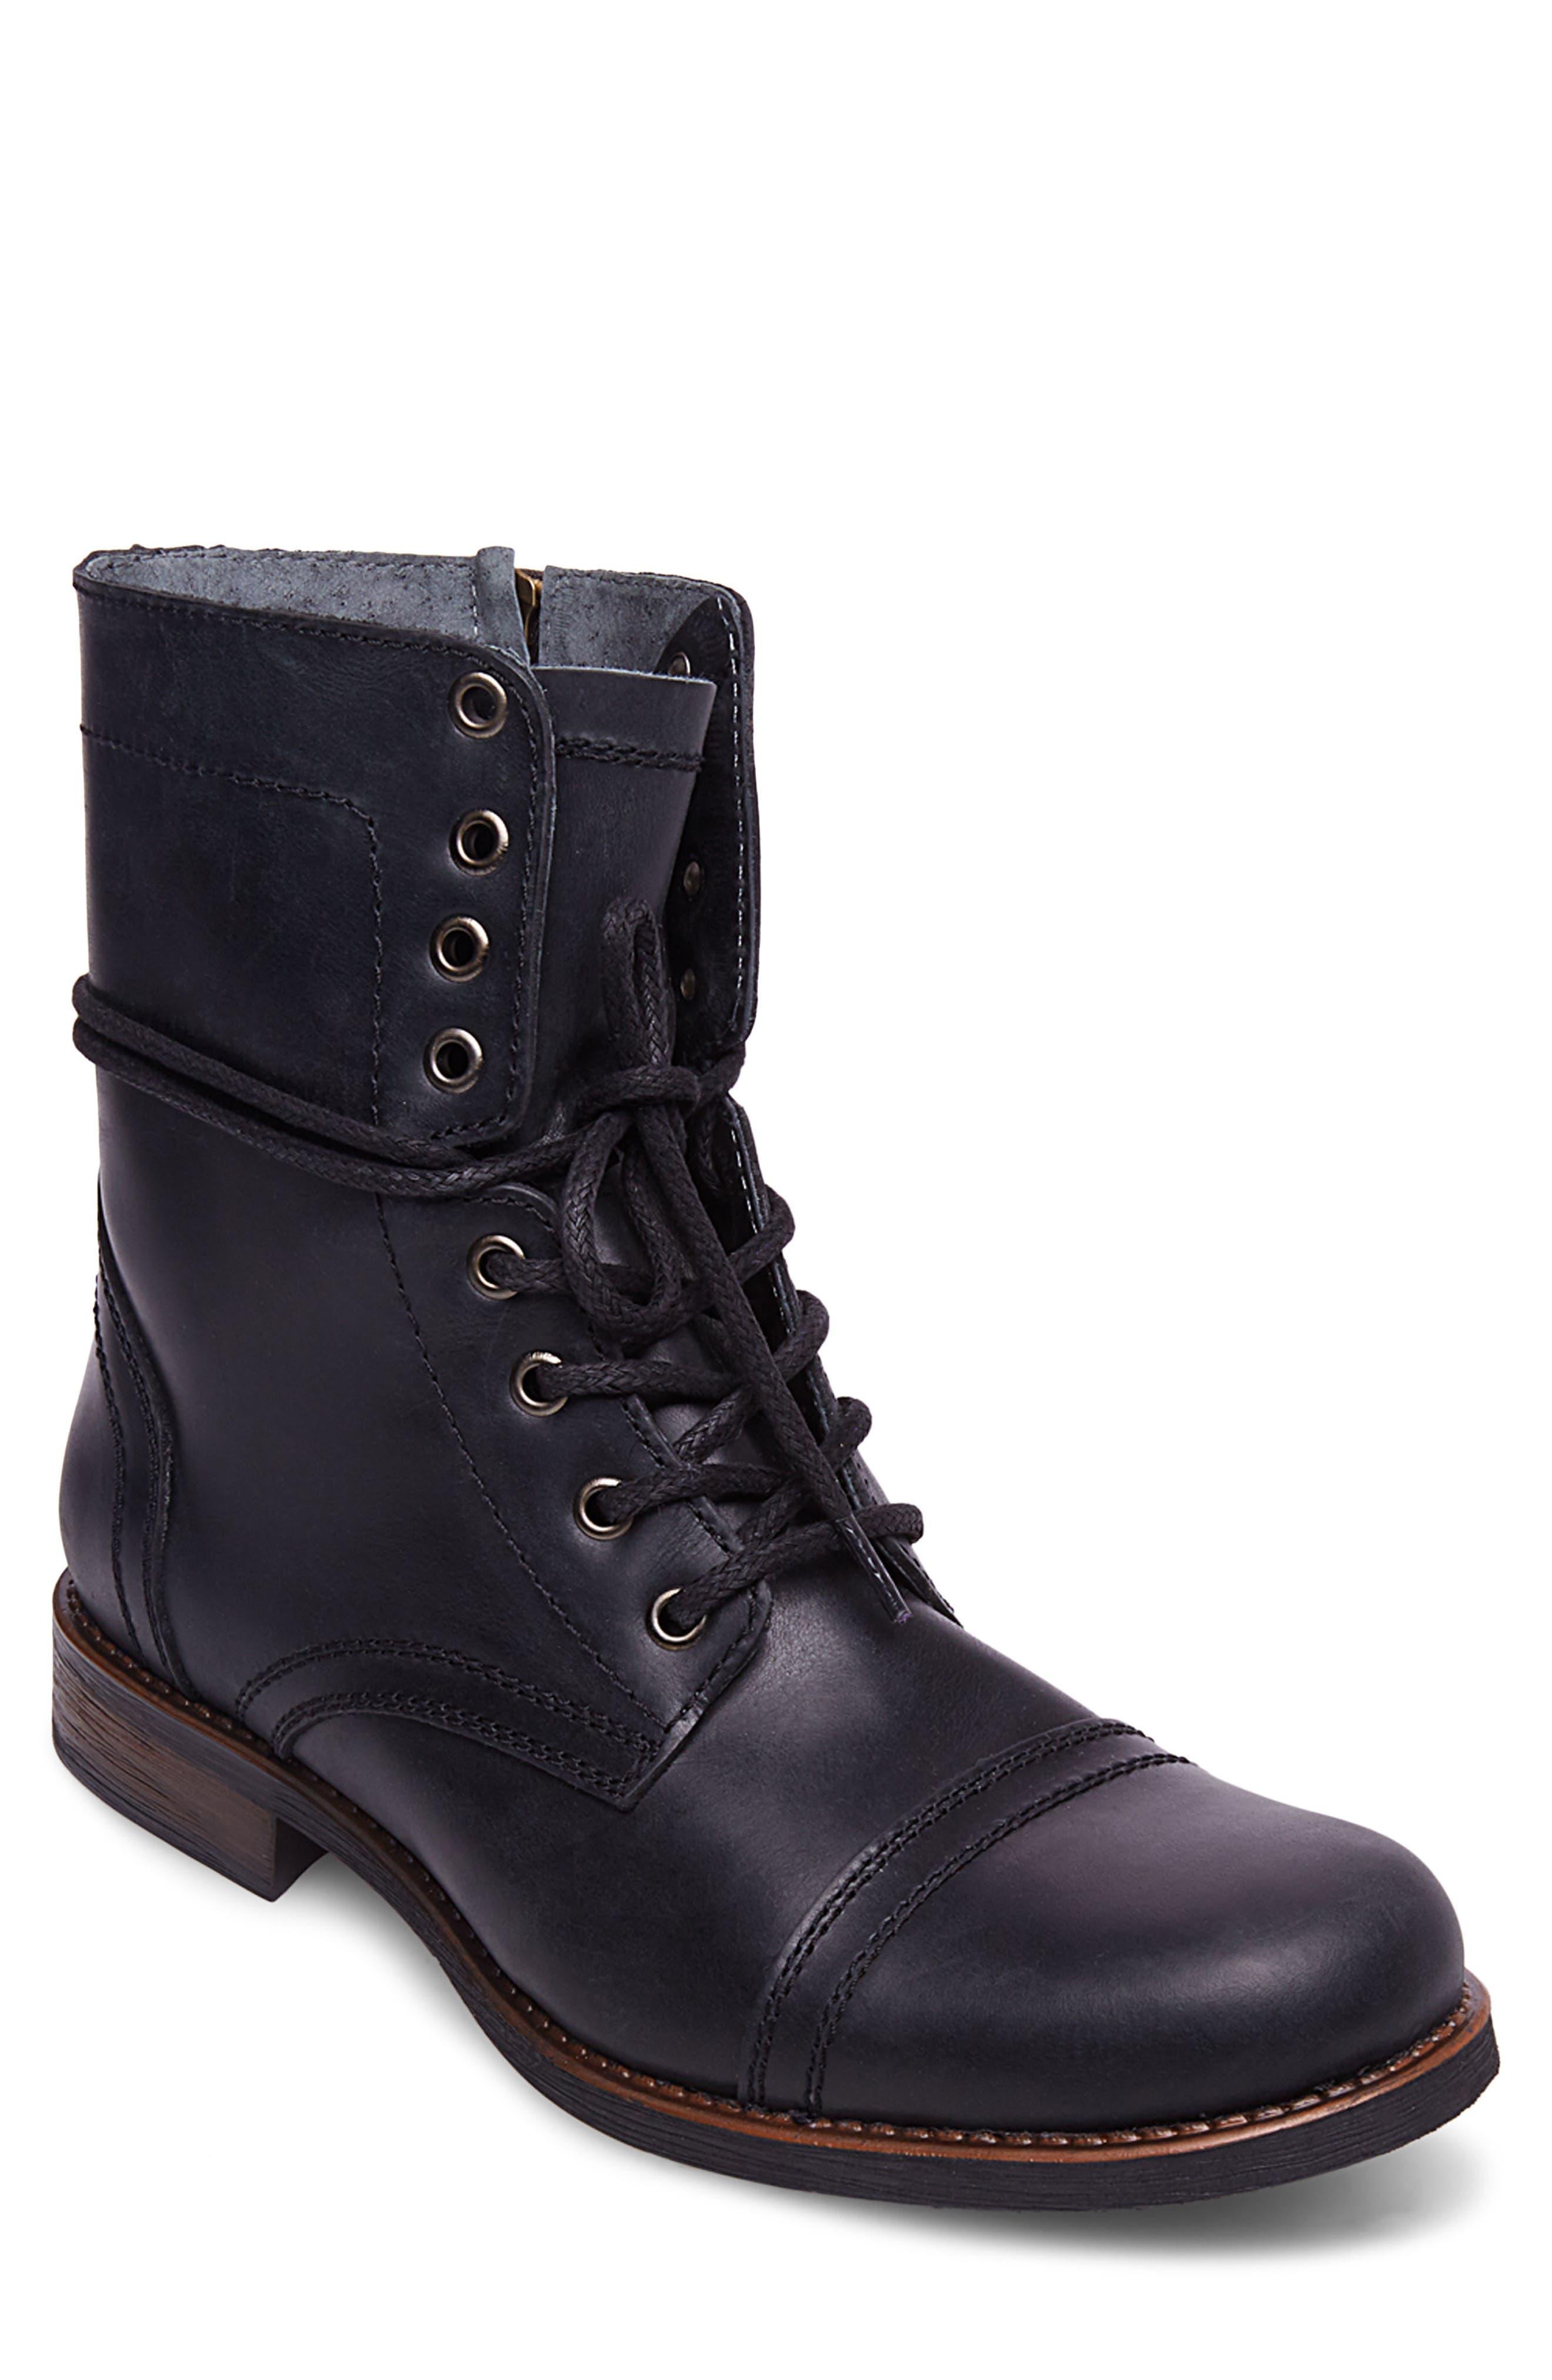 Troopah-C Cap Toe Boot,                             Main thumbnail 1, color,                             Black Leather